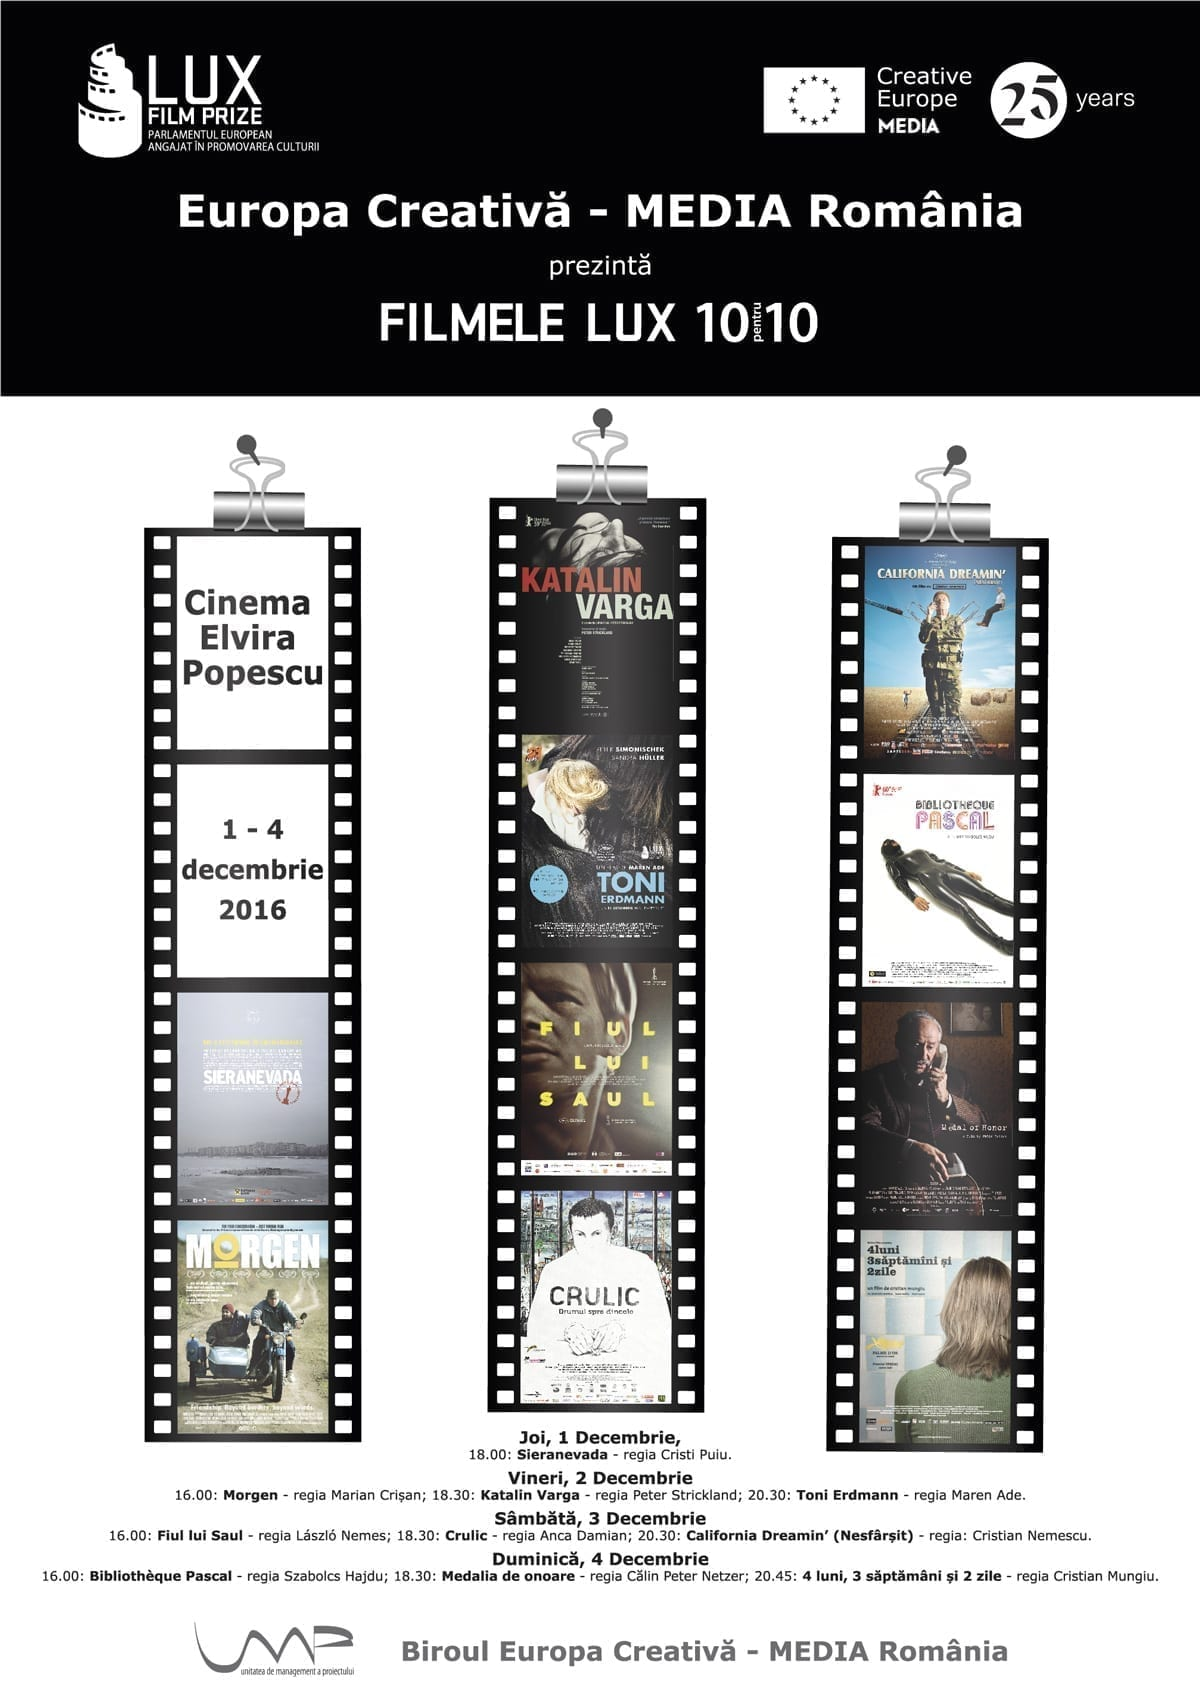 Filmele LUX @ Cinema Elvira Popescu